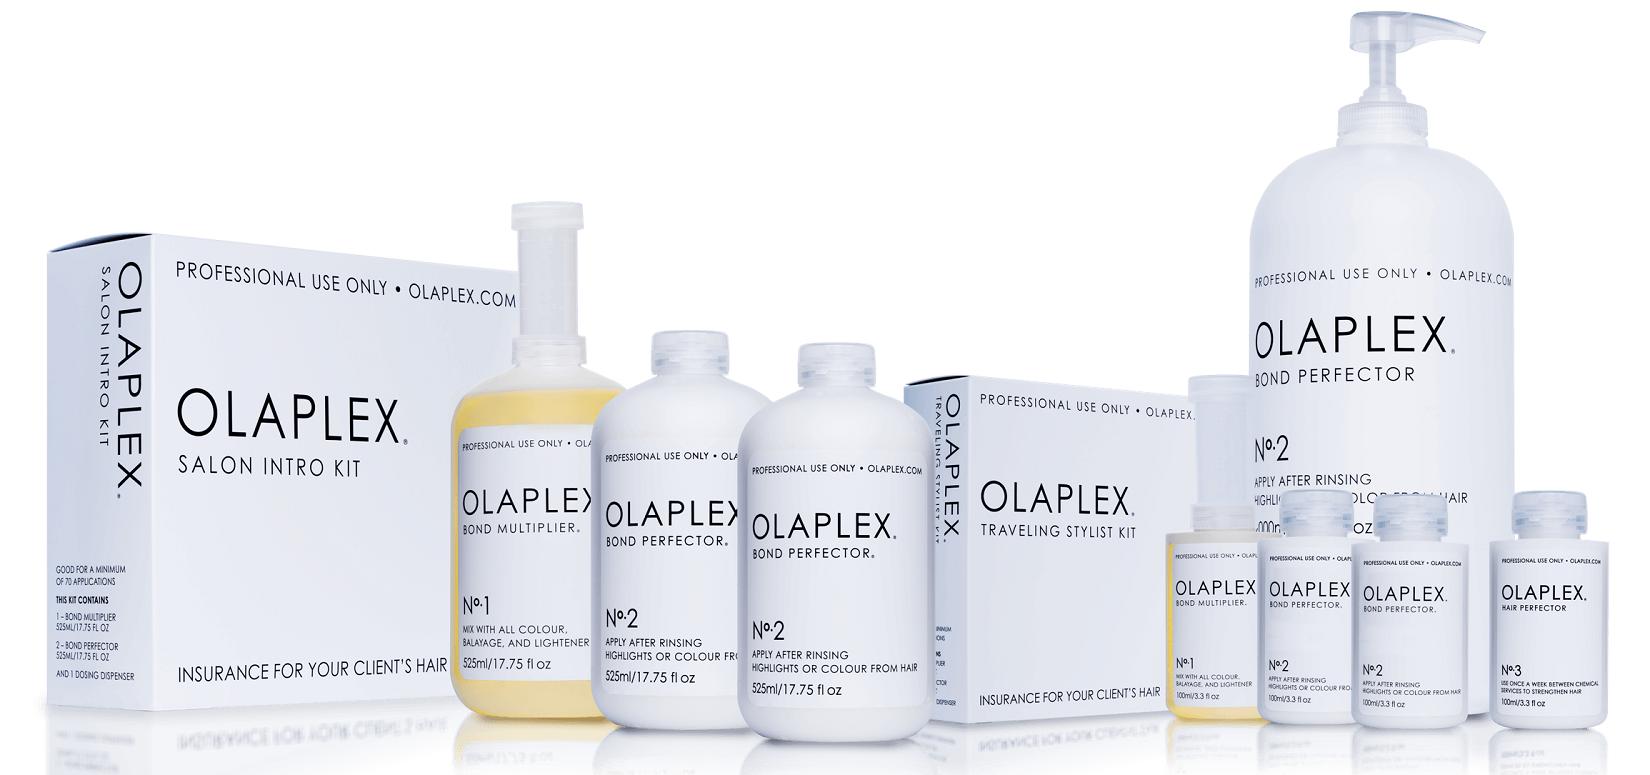 Offizieller Olaplex Salon Stuttgart, Esslingen, Göppingen, Nürtingen und Kirchheim Teck | Hair & Style - Altbach